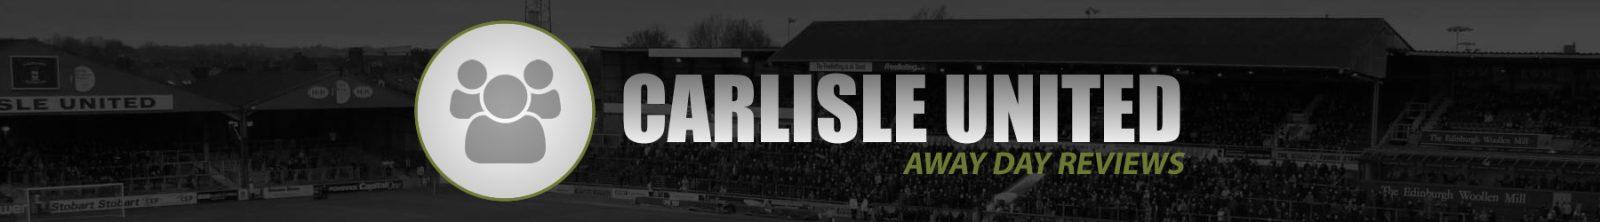 Review Carlisle United